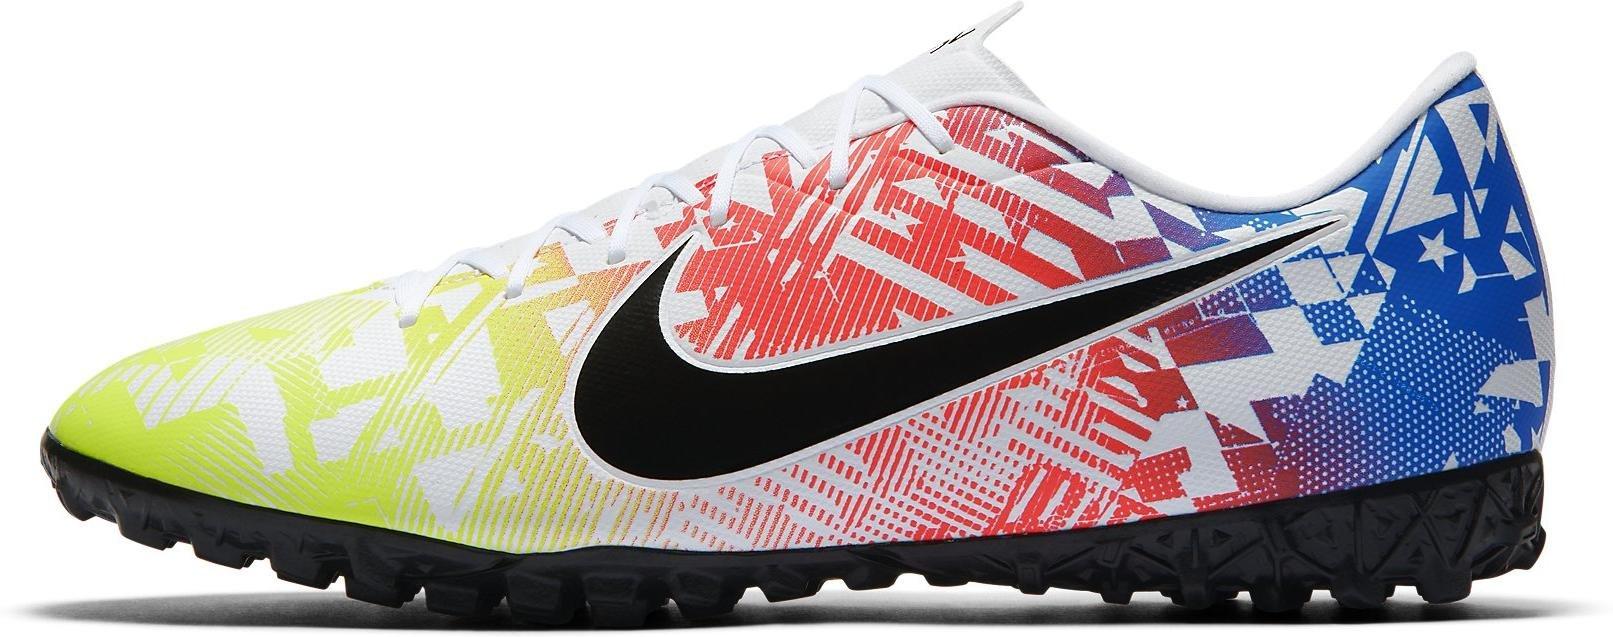 Kopačky Nike VAPOR 13 ACADEMY NJR TF bílá